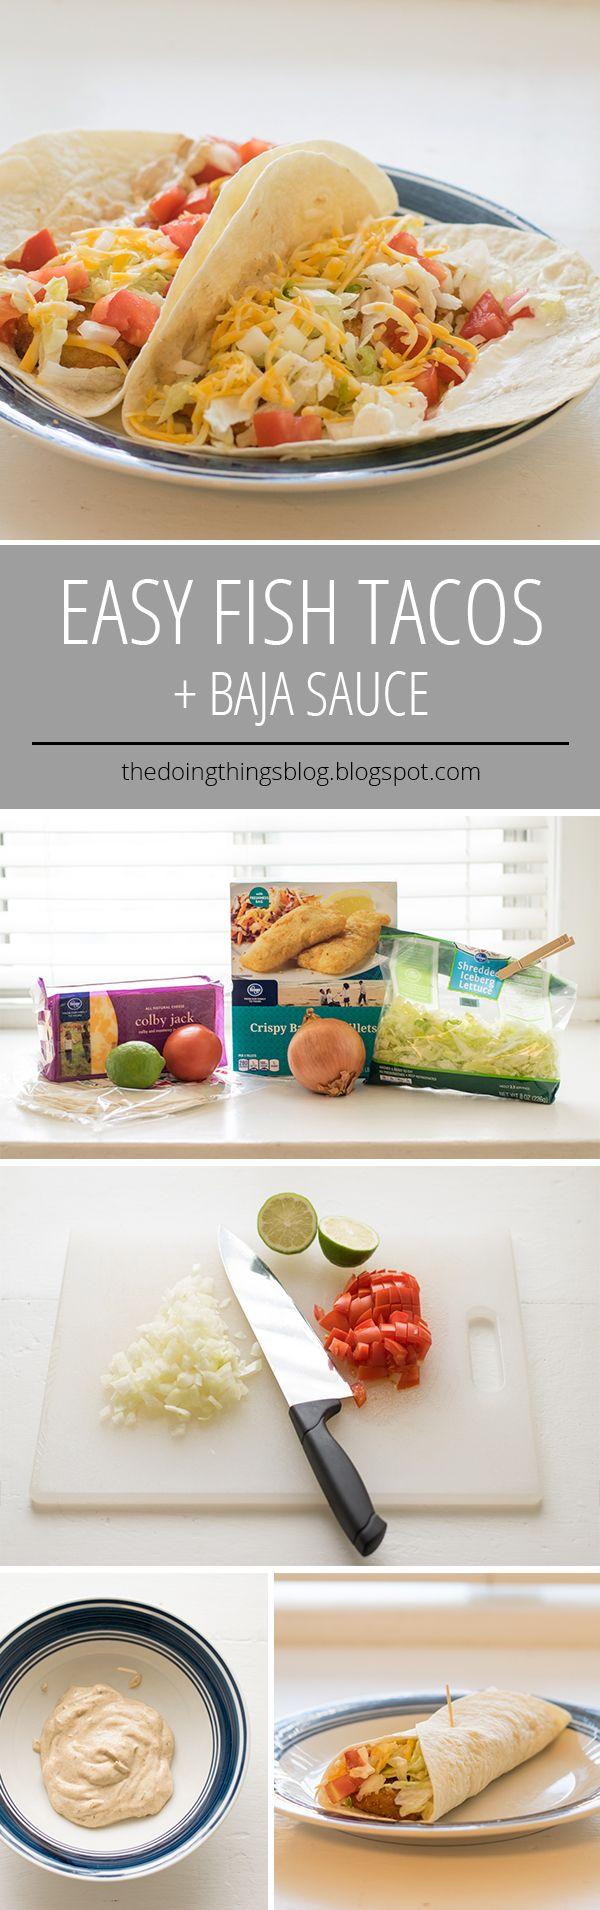 Easy fish tacos baja sauce sauces fish and recipes for Easy fish taco recipes